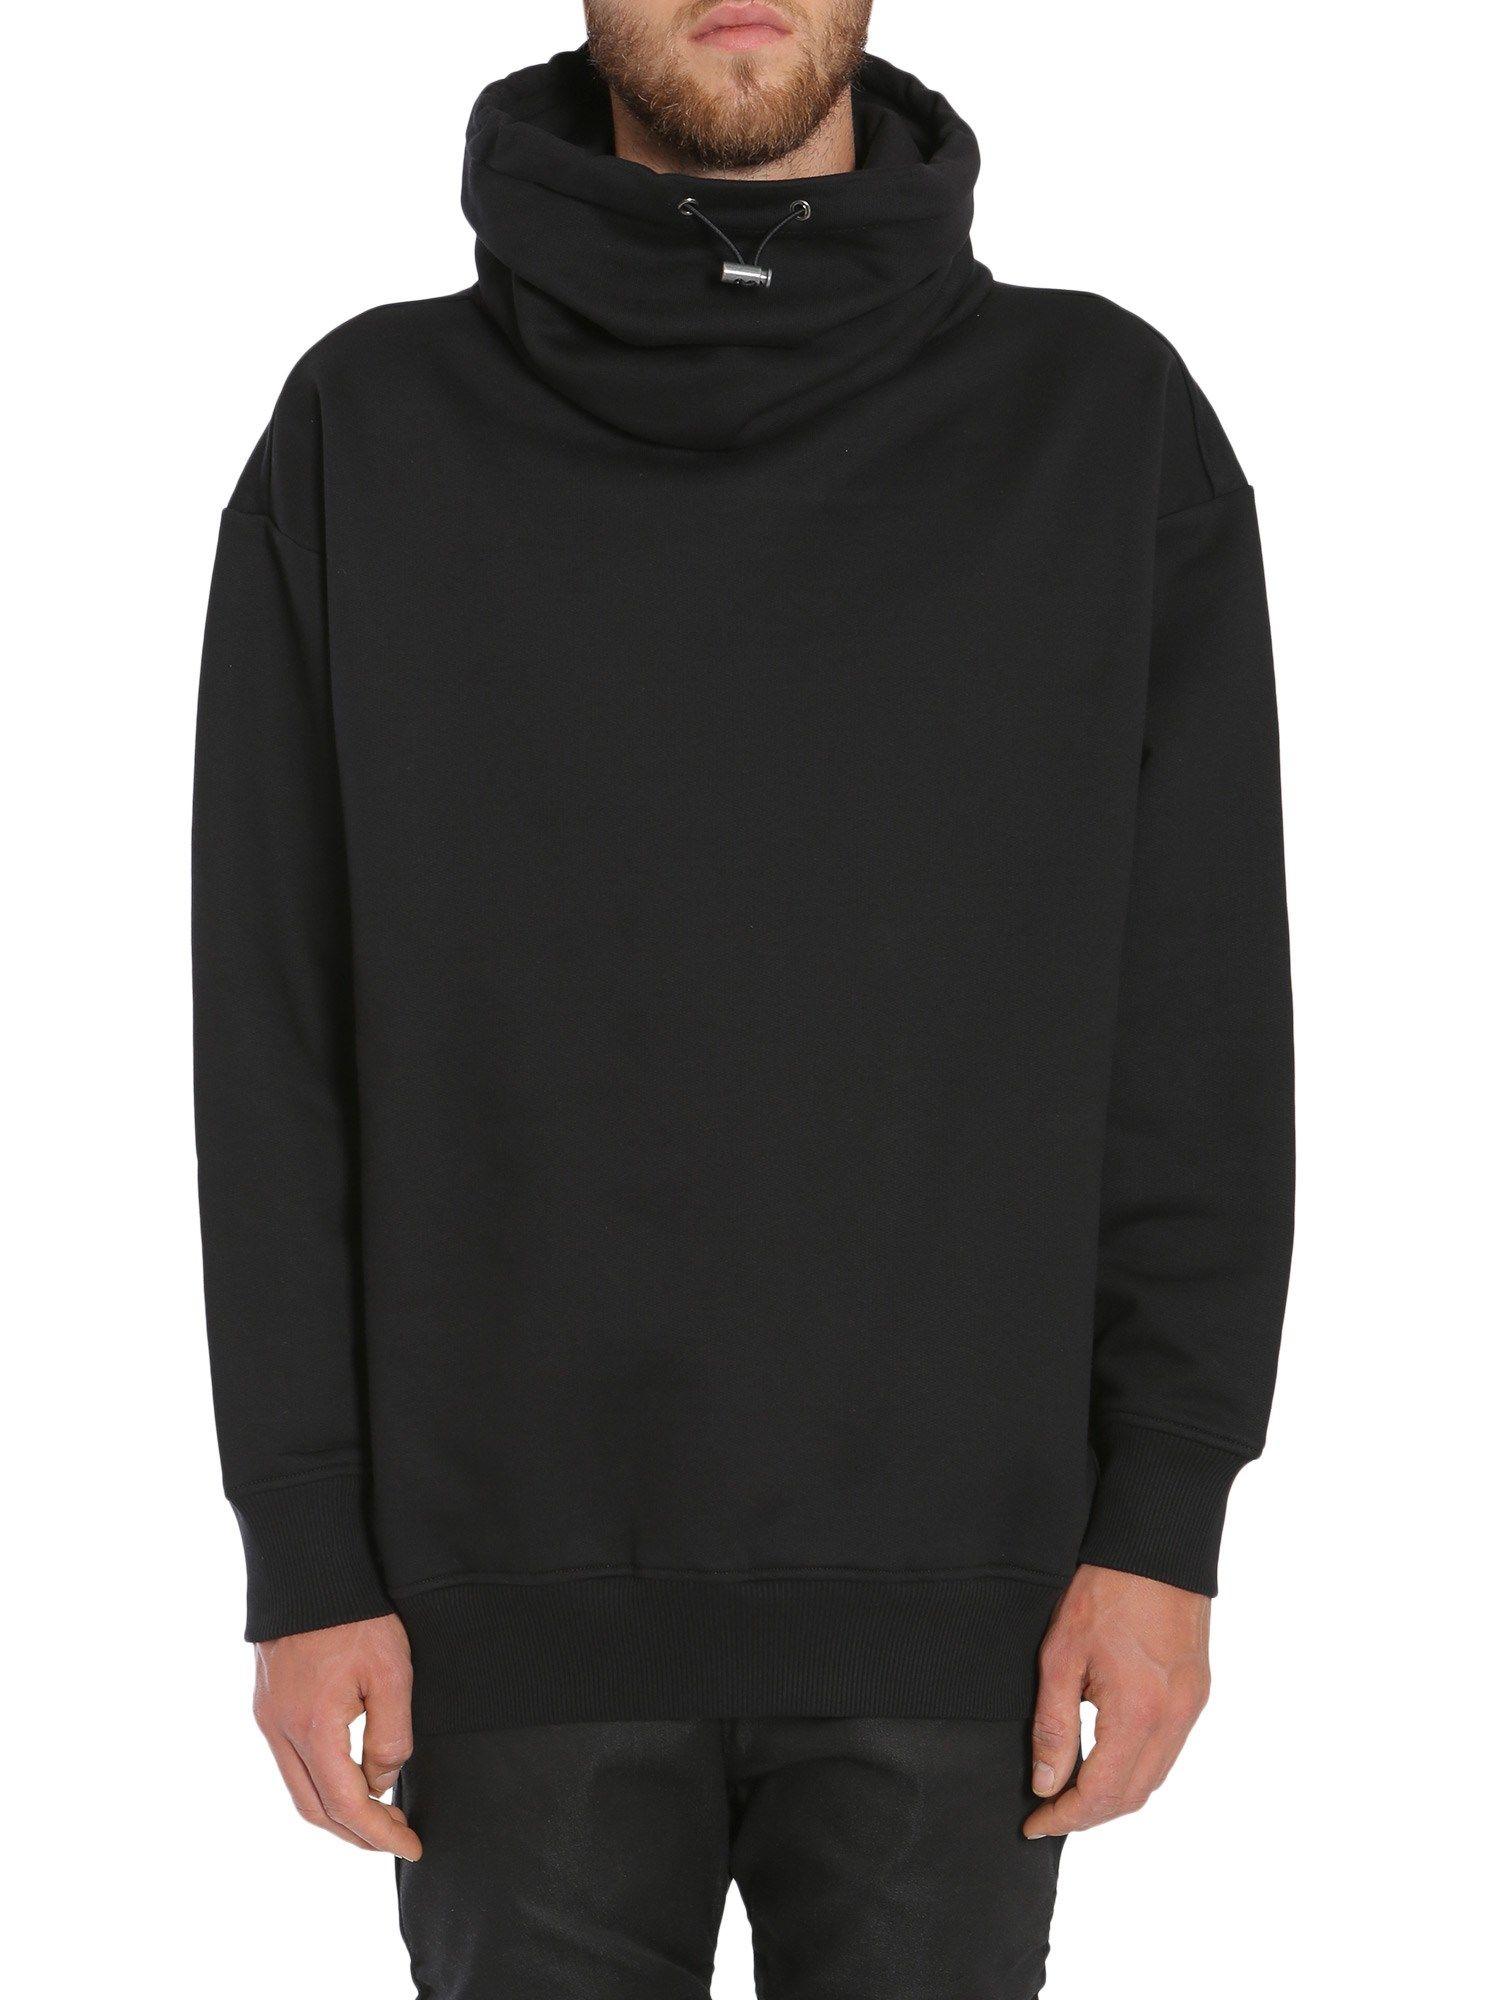 Sollus Sweatshirt